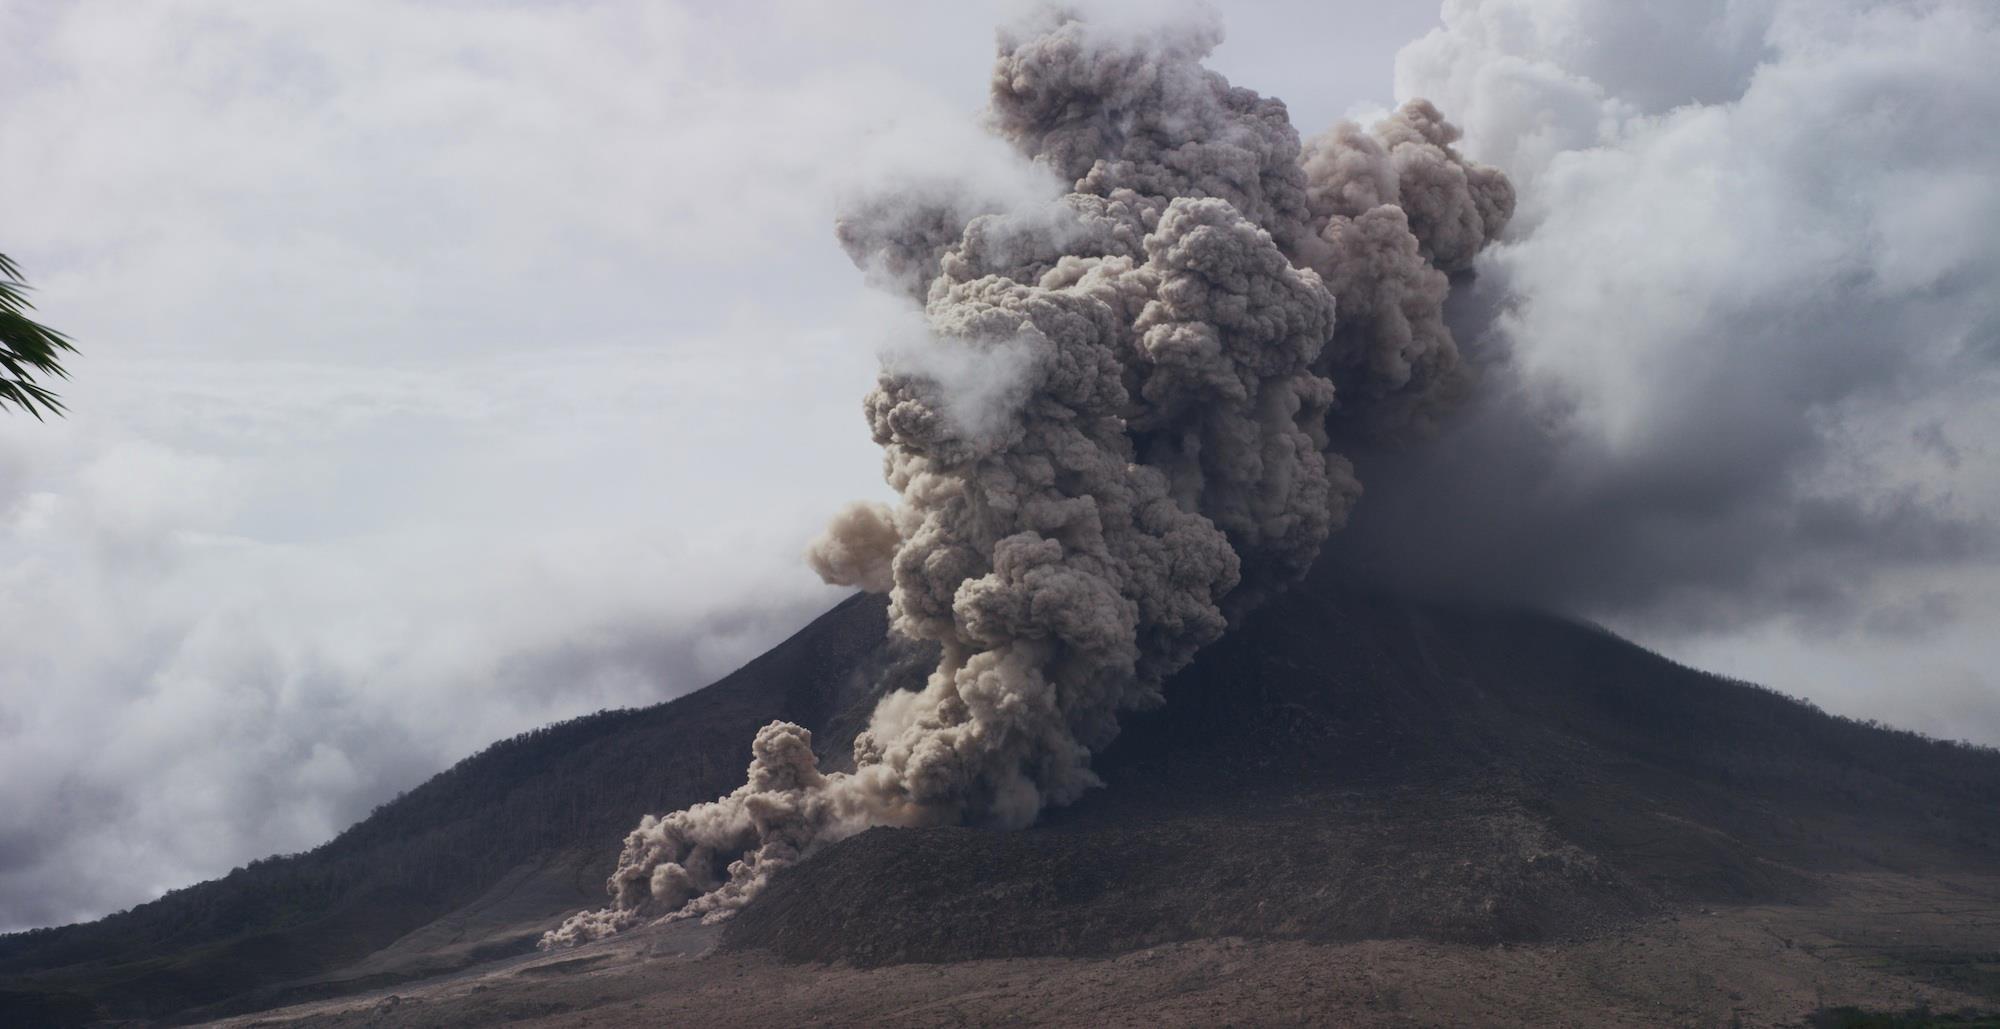 Volcanic eruption stock footage